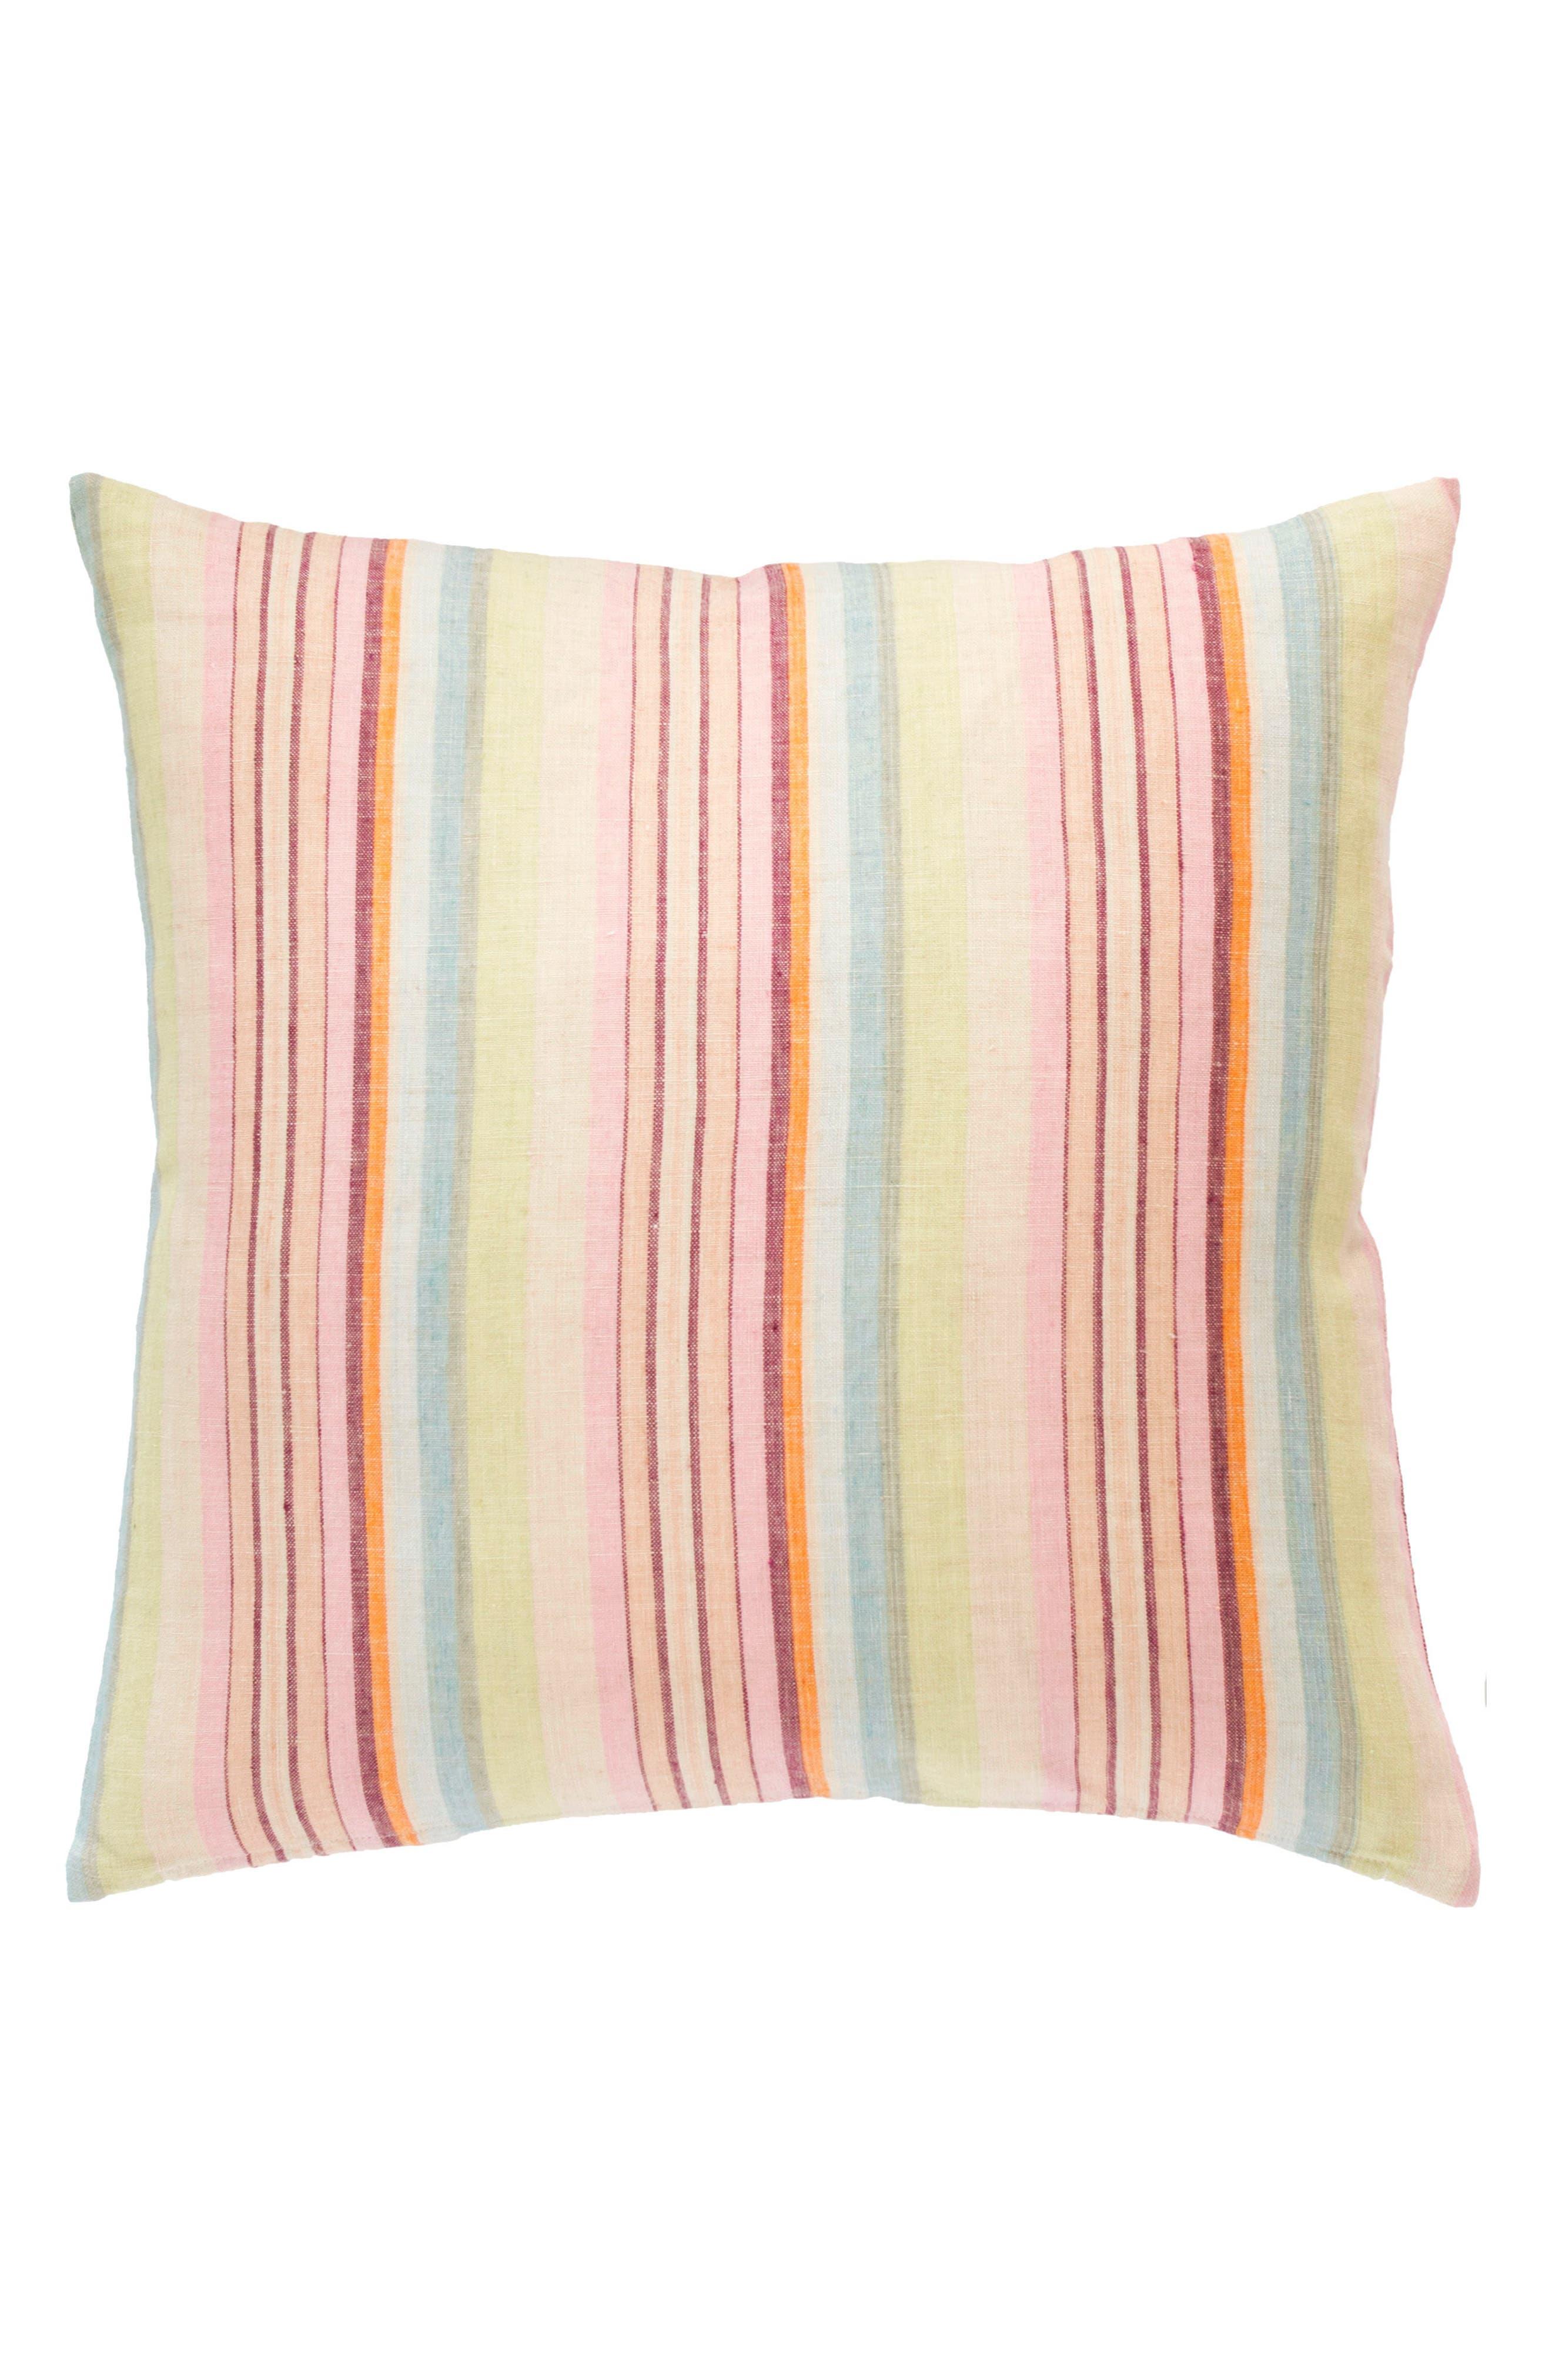 Savona Stripe Linen Accent Pillow,                             Main thumbnail 1, color,                             Pink